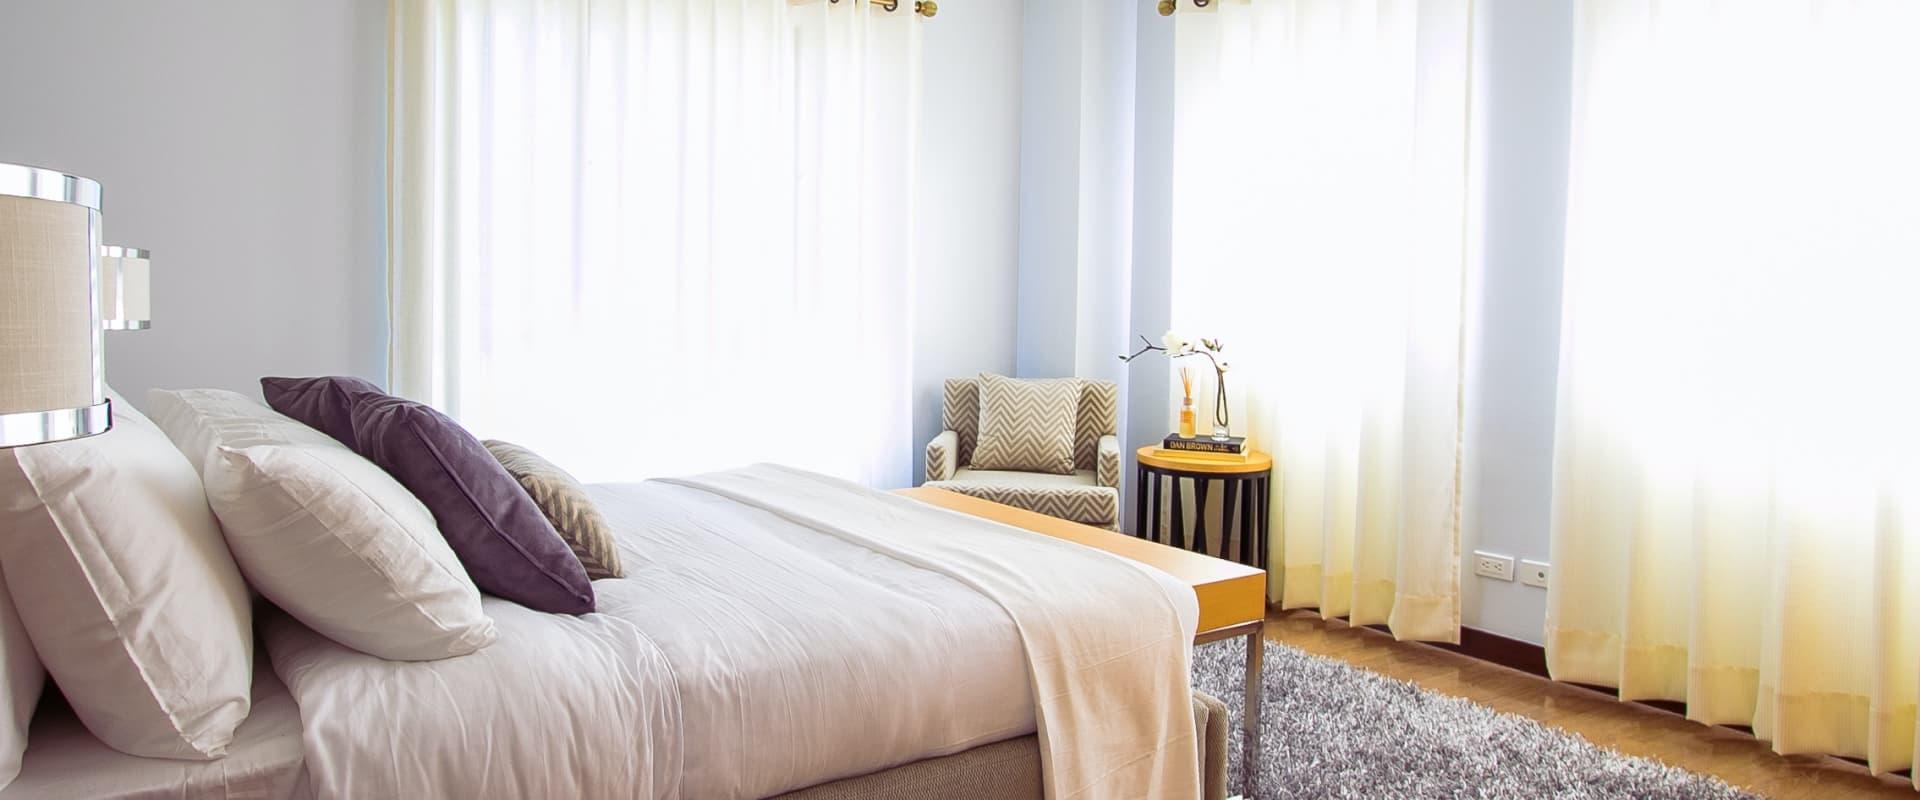 custom beds ireland